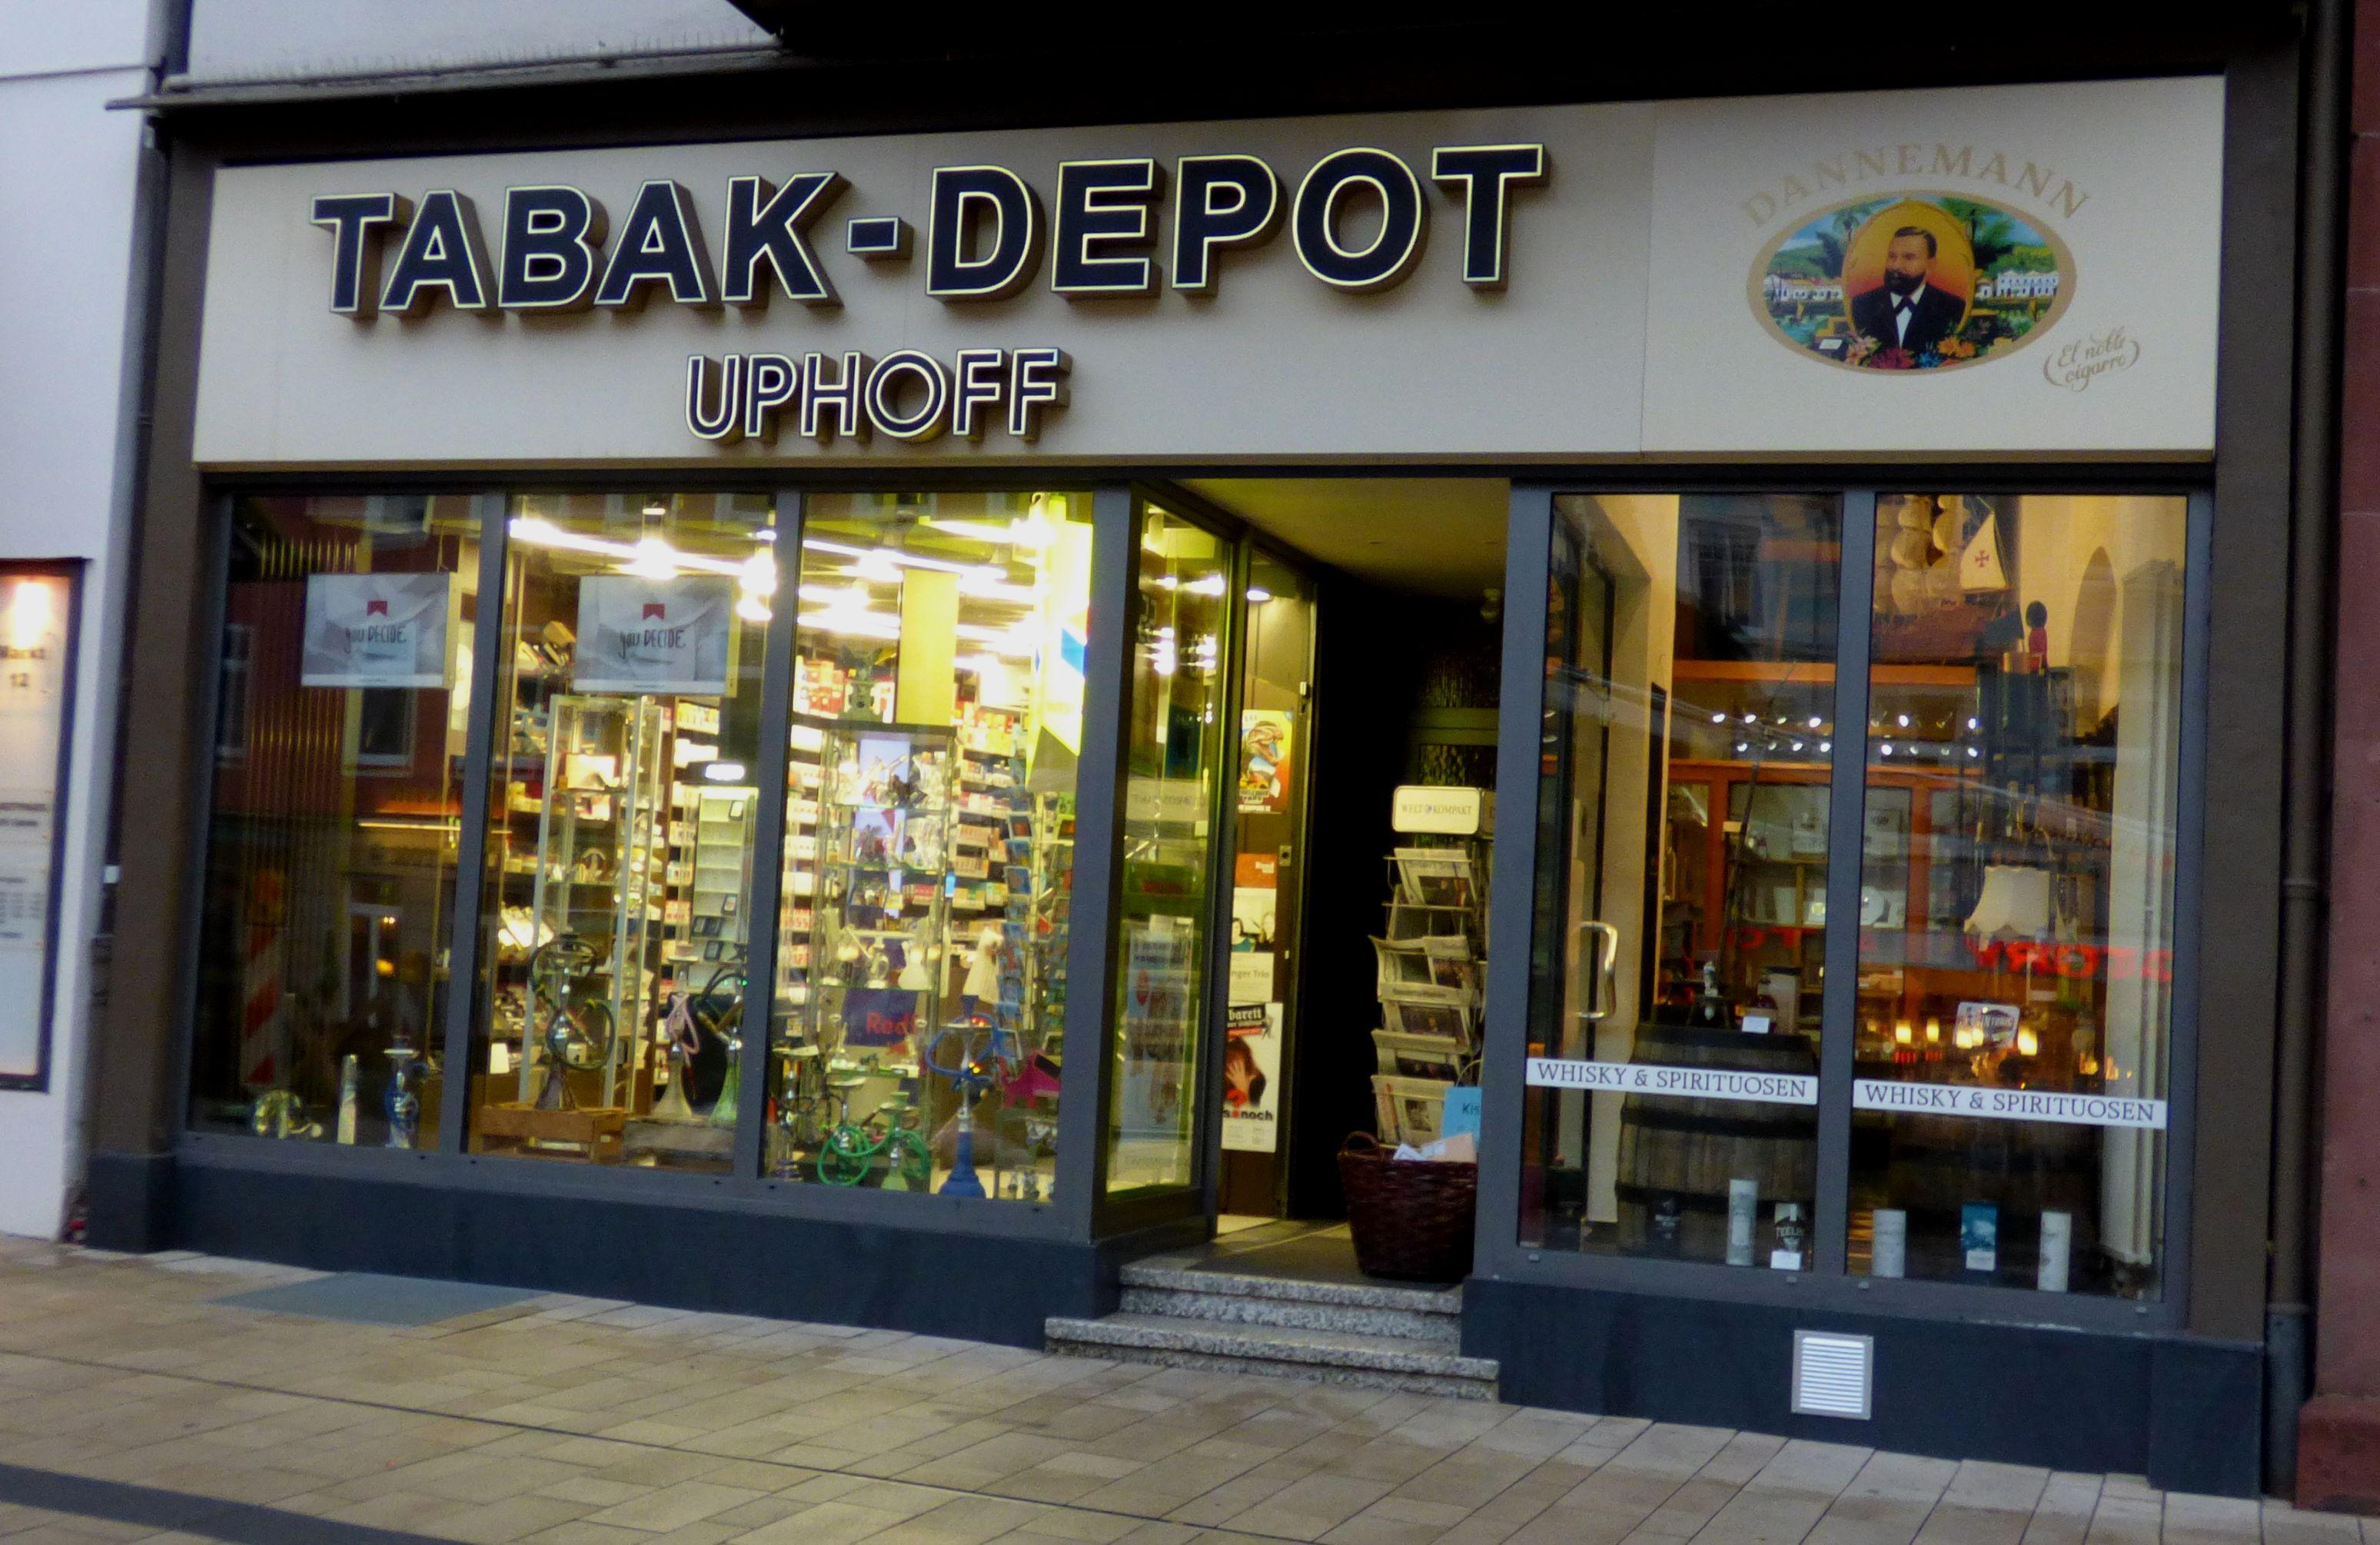 Tabak Depot Uphoff